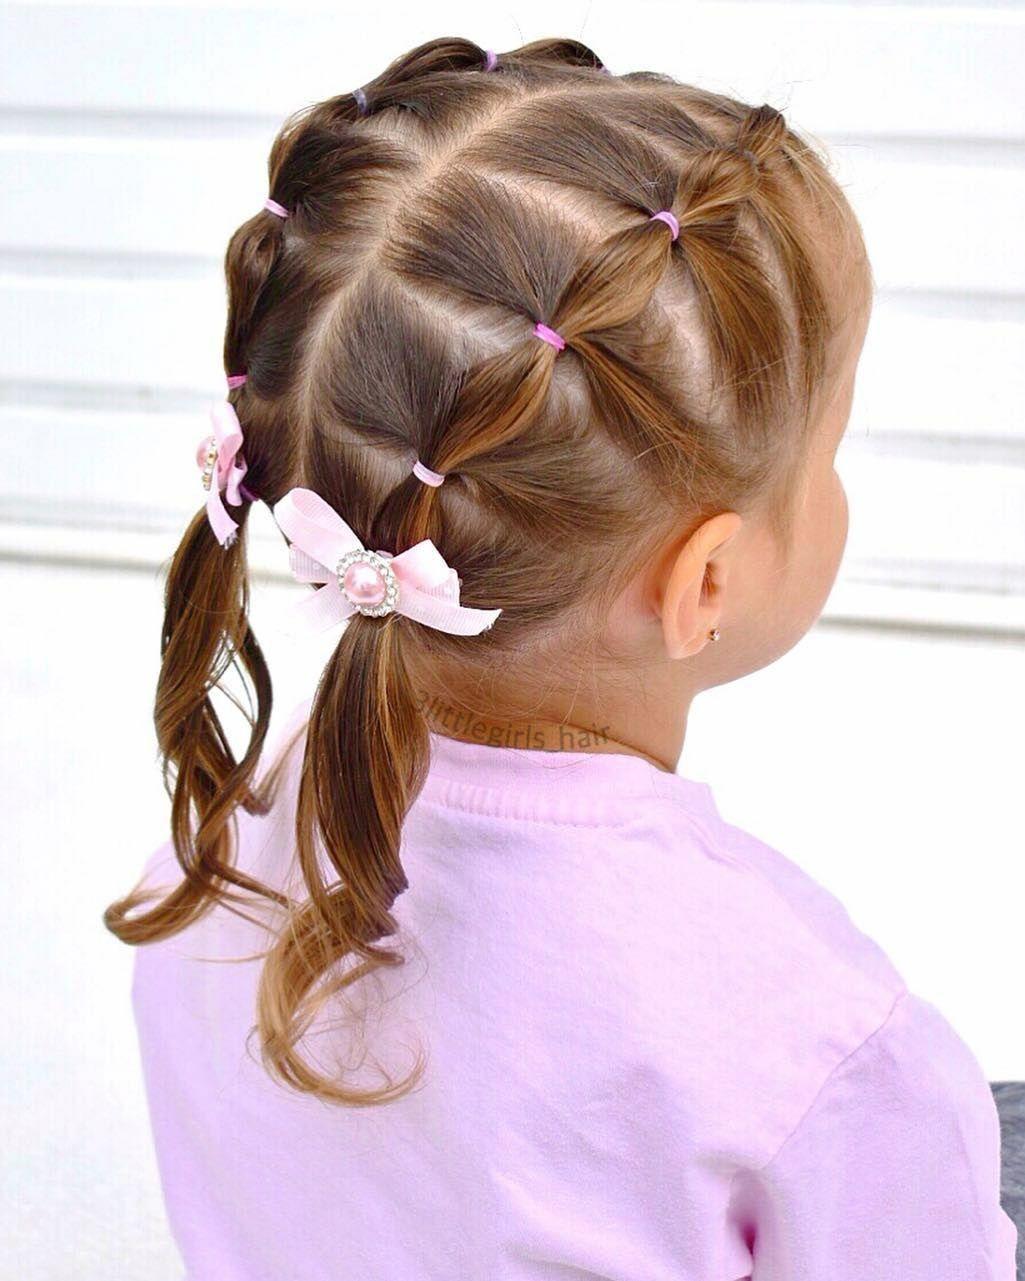 BH Toddler Hairstyles Girl